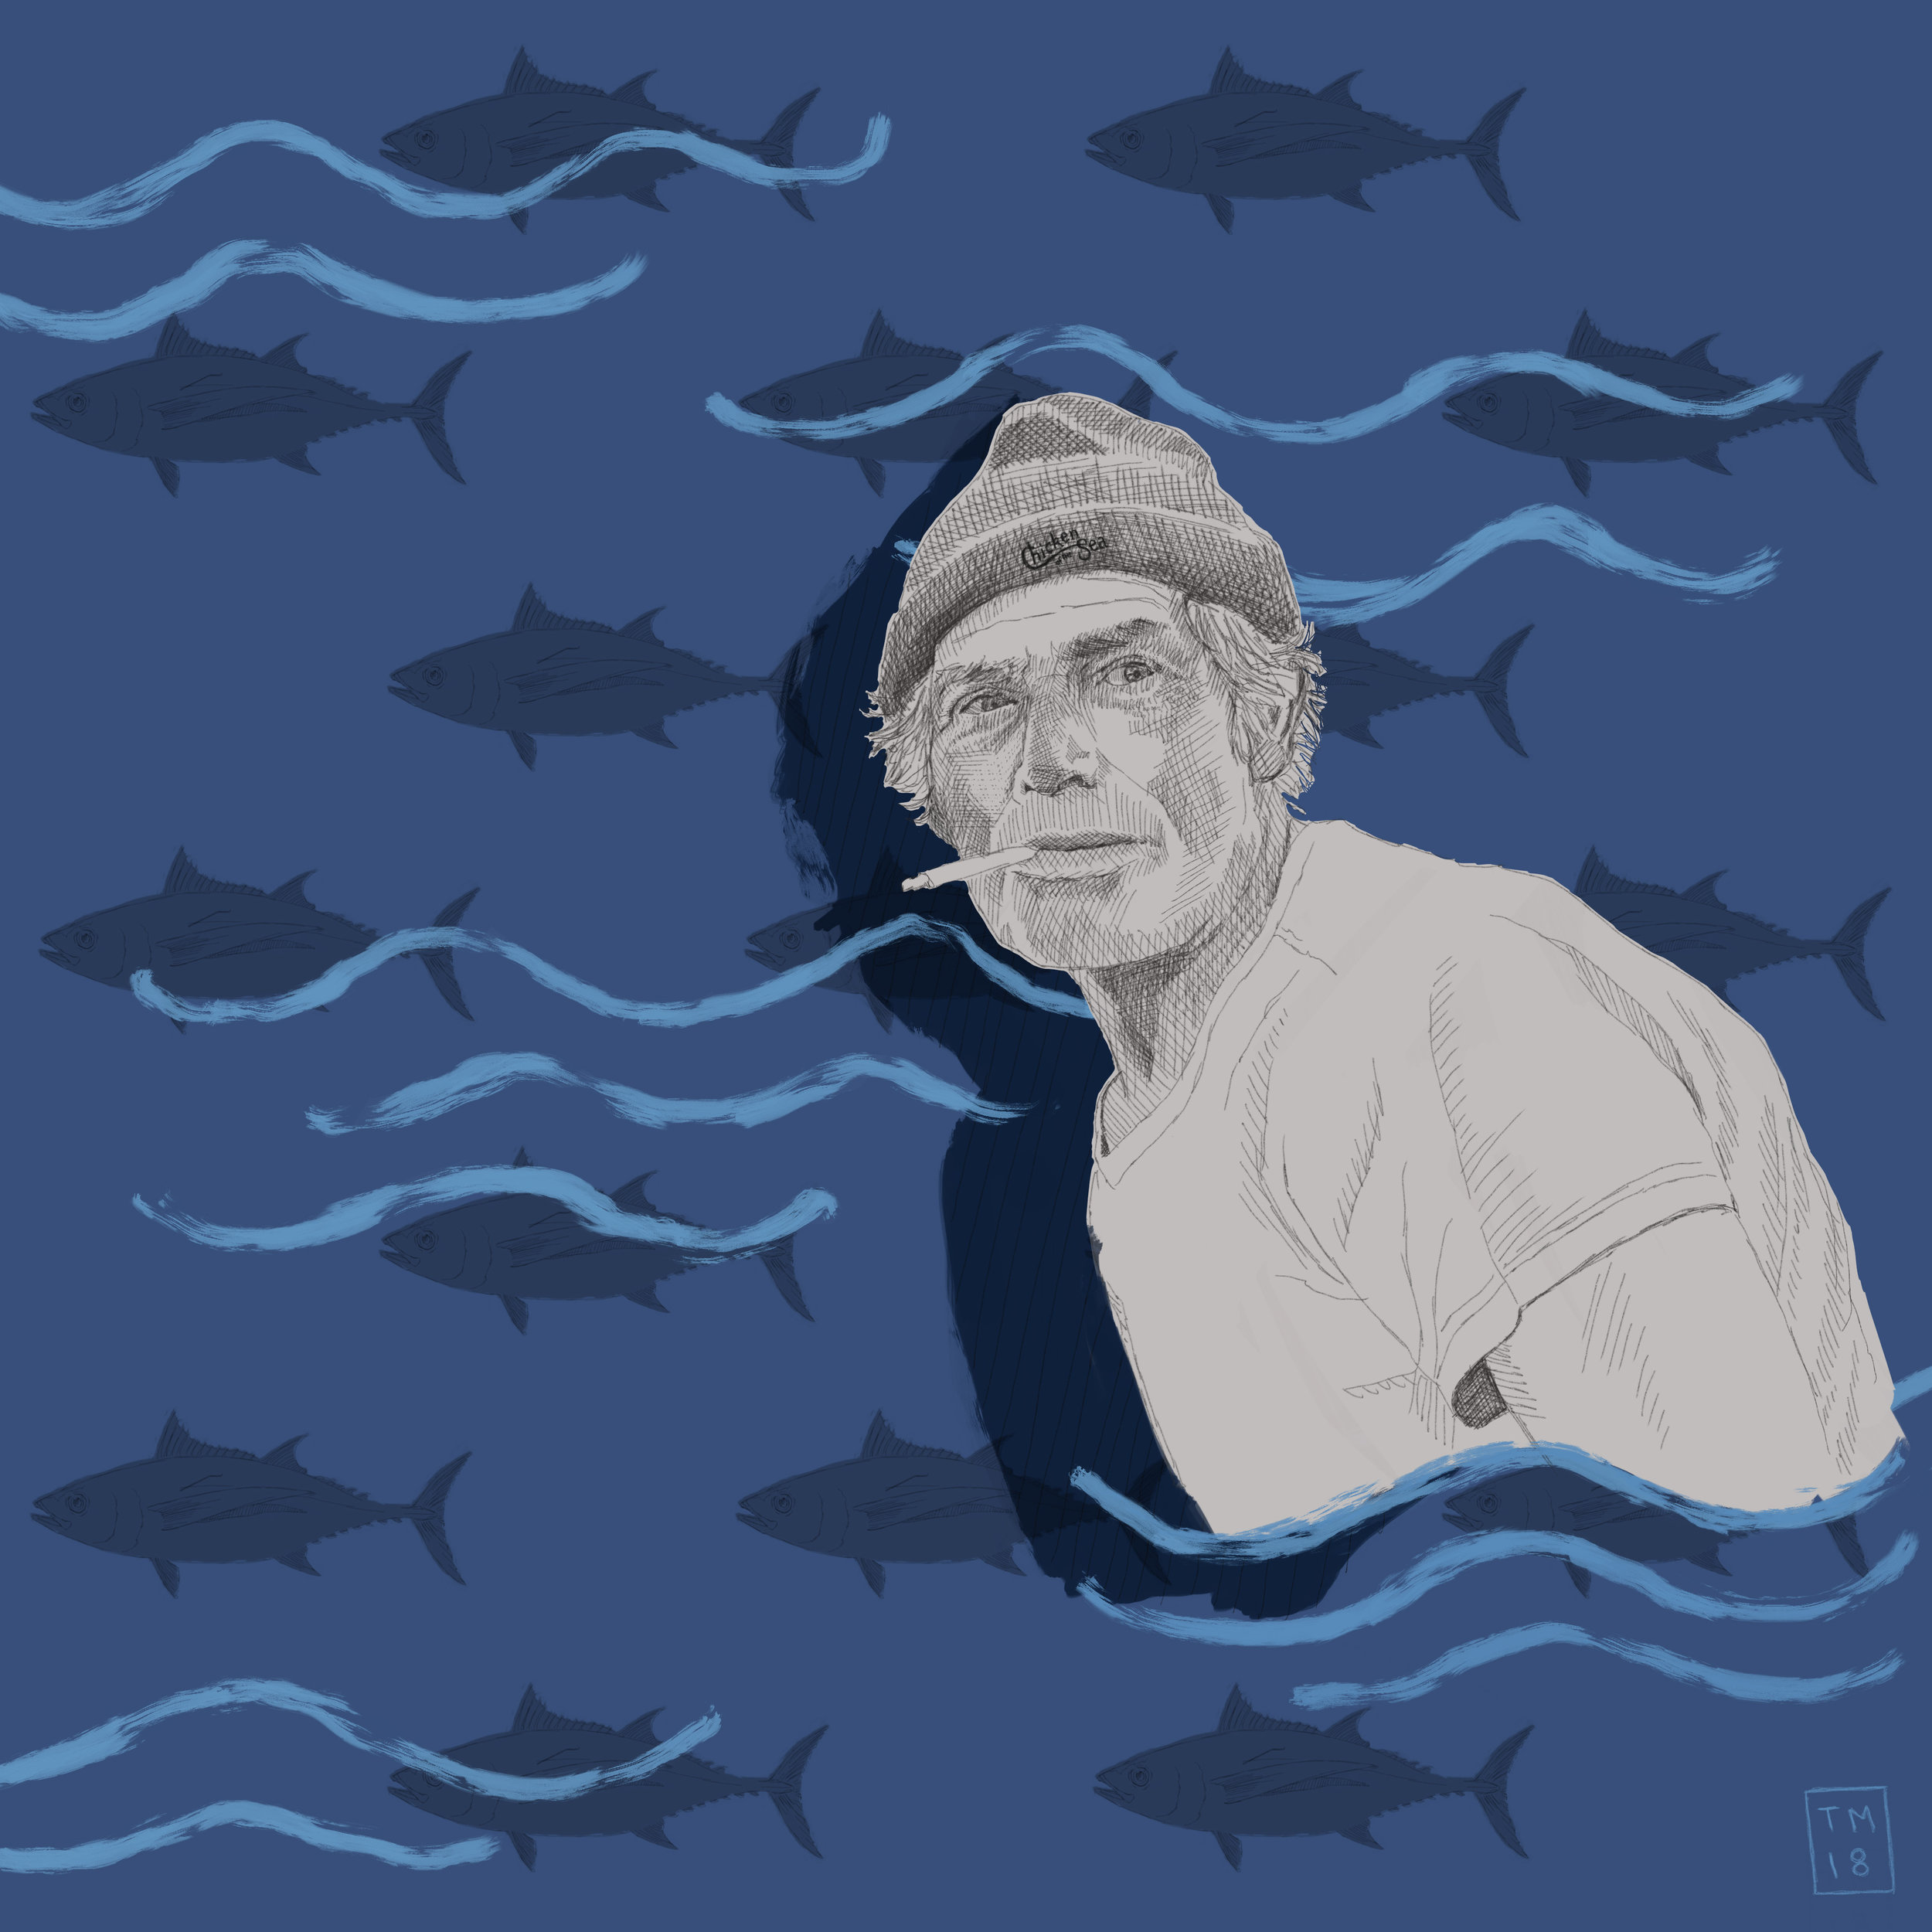 Fisherman Digital Drawing1.jpg